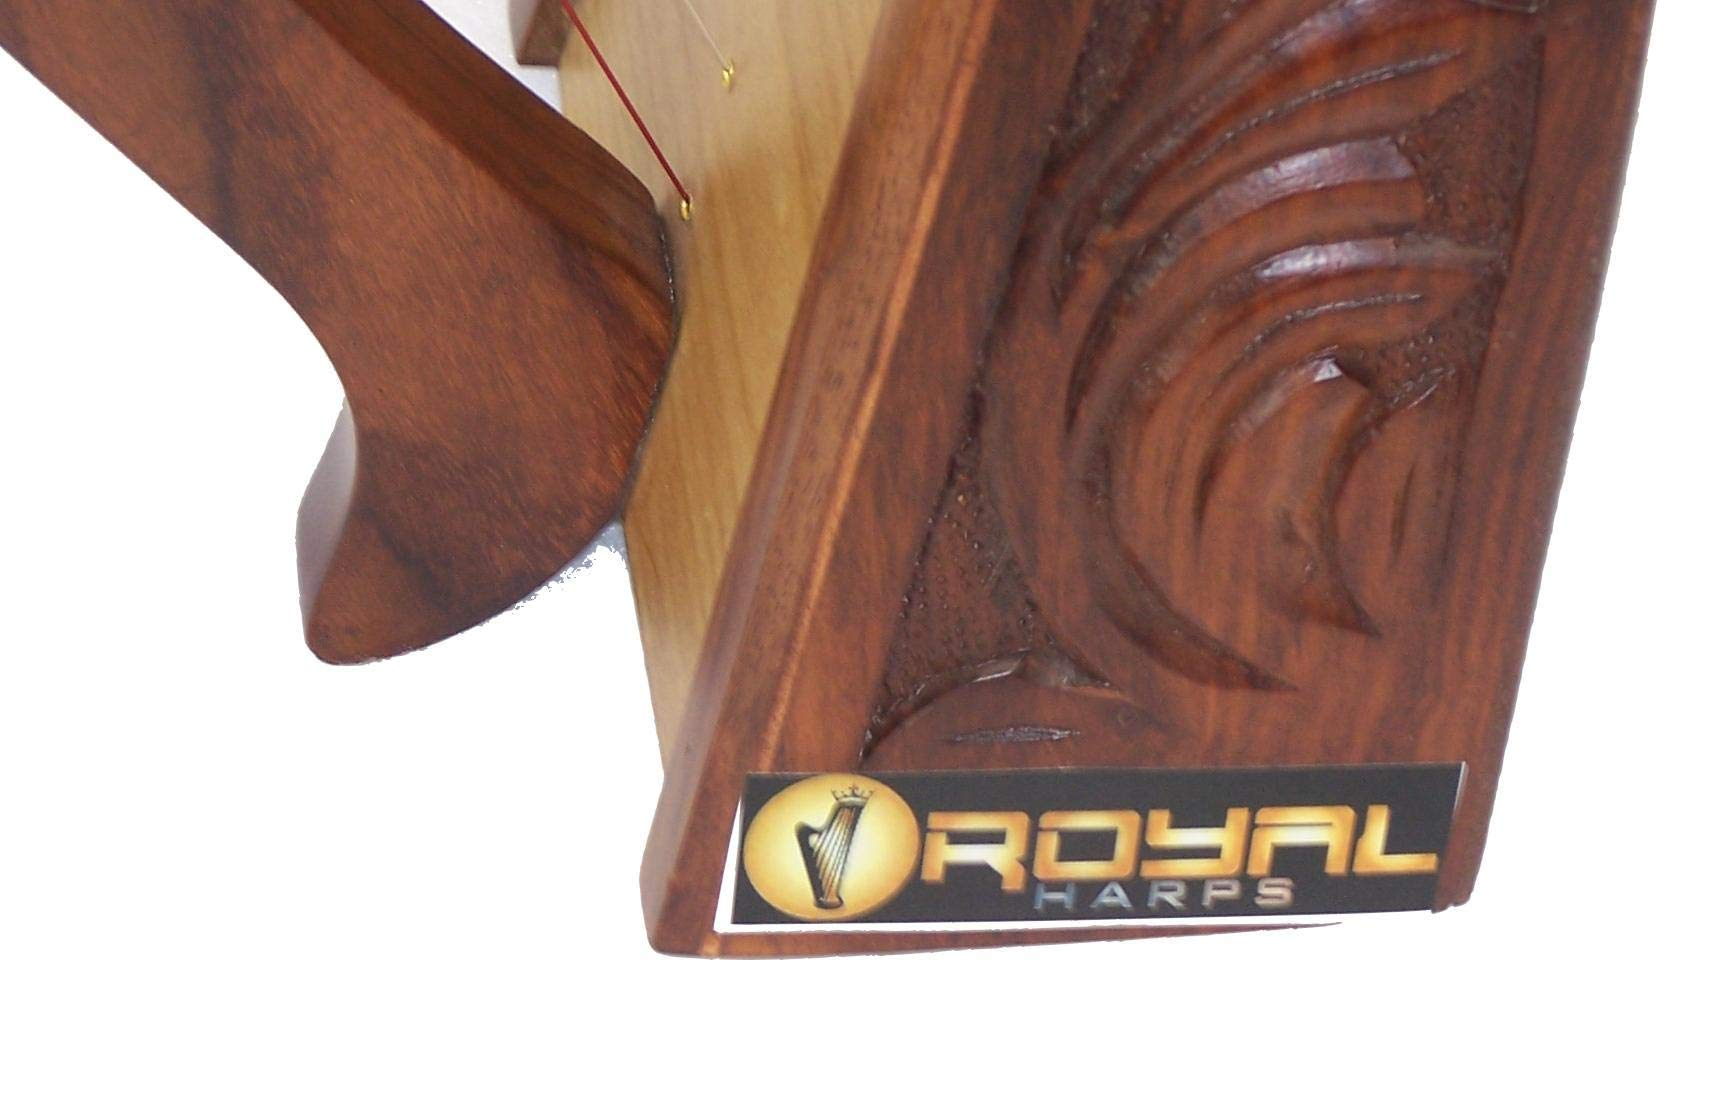 Celtic Irish Baby Harp 12 Strings Solid Wood Free Bag Strings Key by ROYAL HARPS (Image #5)